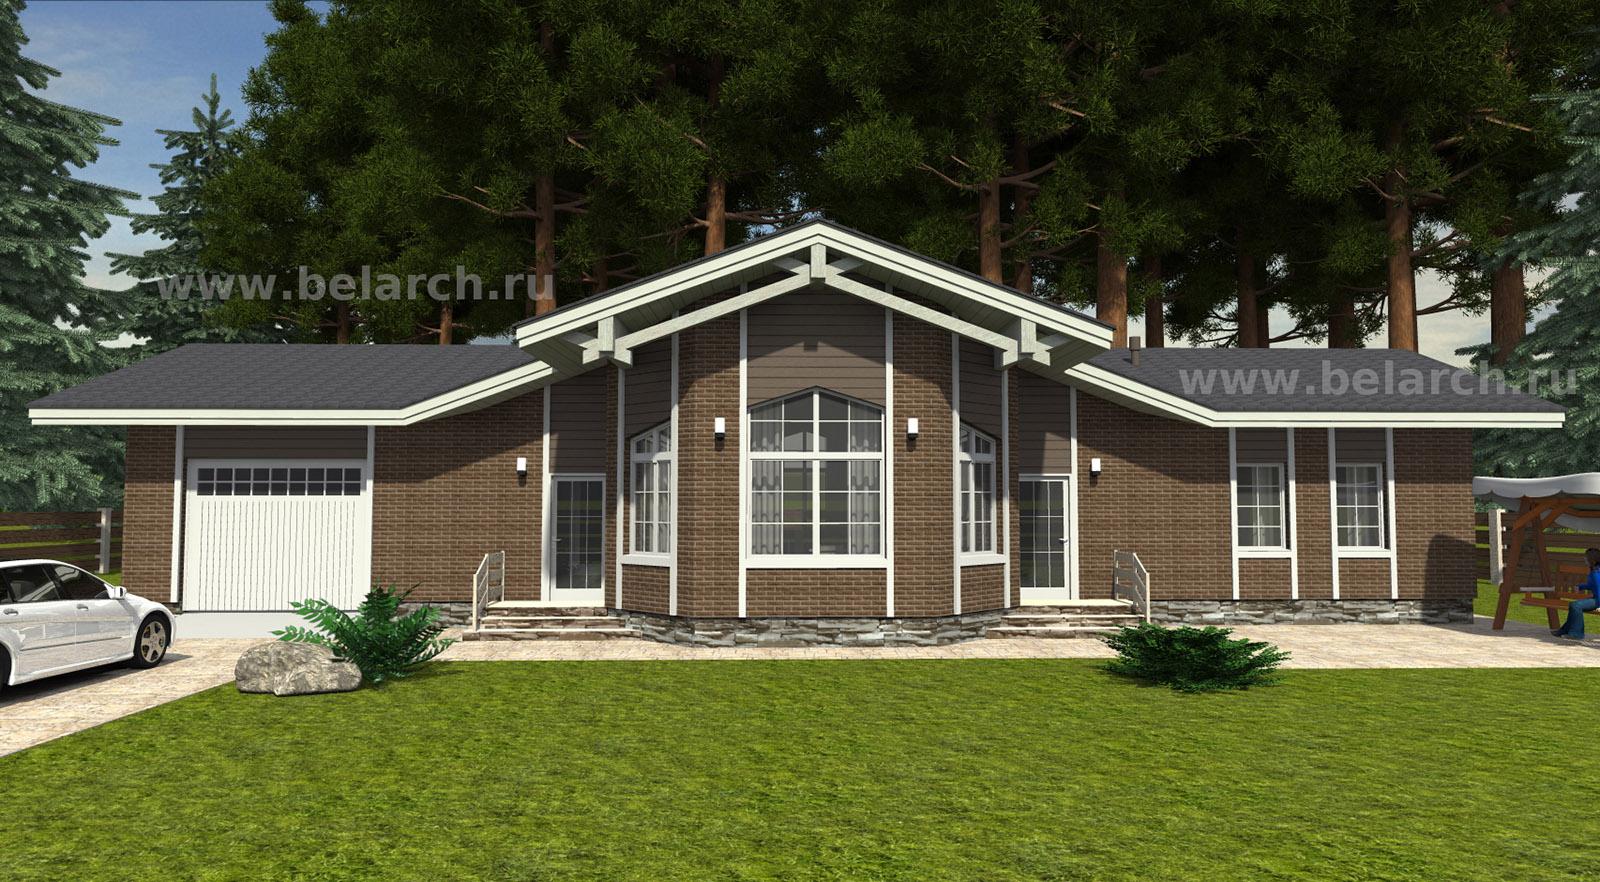 Проект вытянутого дома